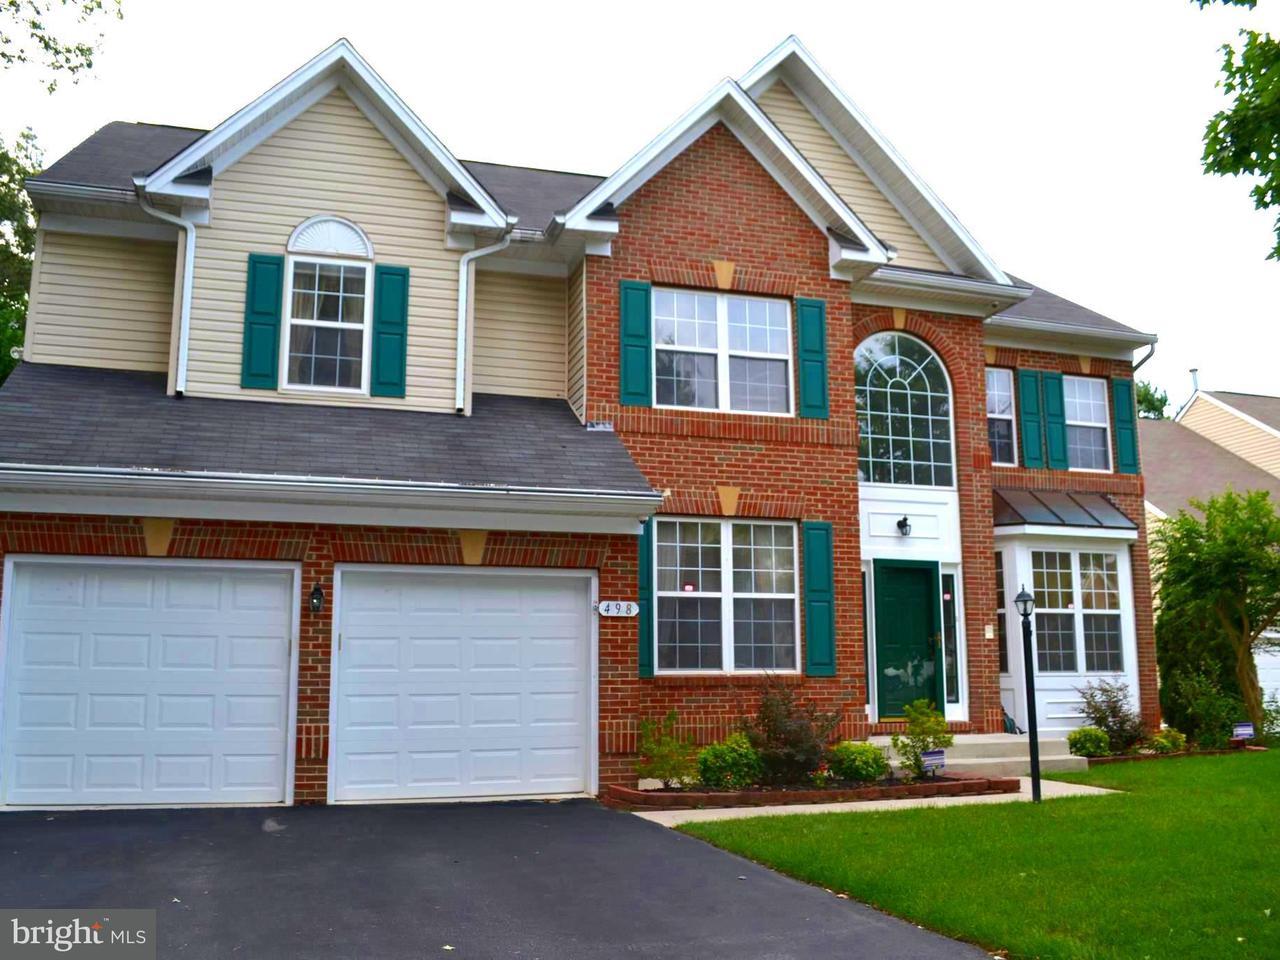 Single Family Home for Sale at 498 Mcbride Lane 498 Mcbride Lane Severna Park, Maryland 21146 United States